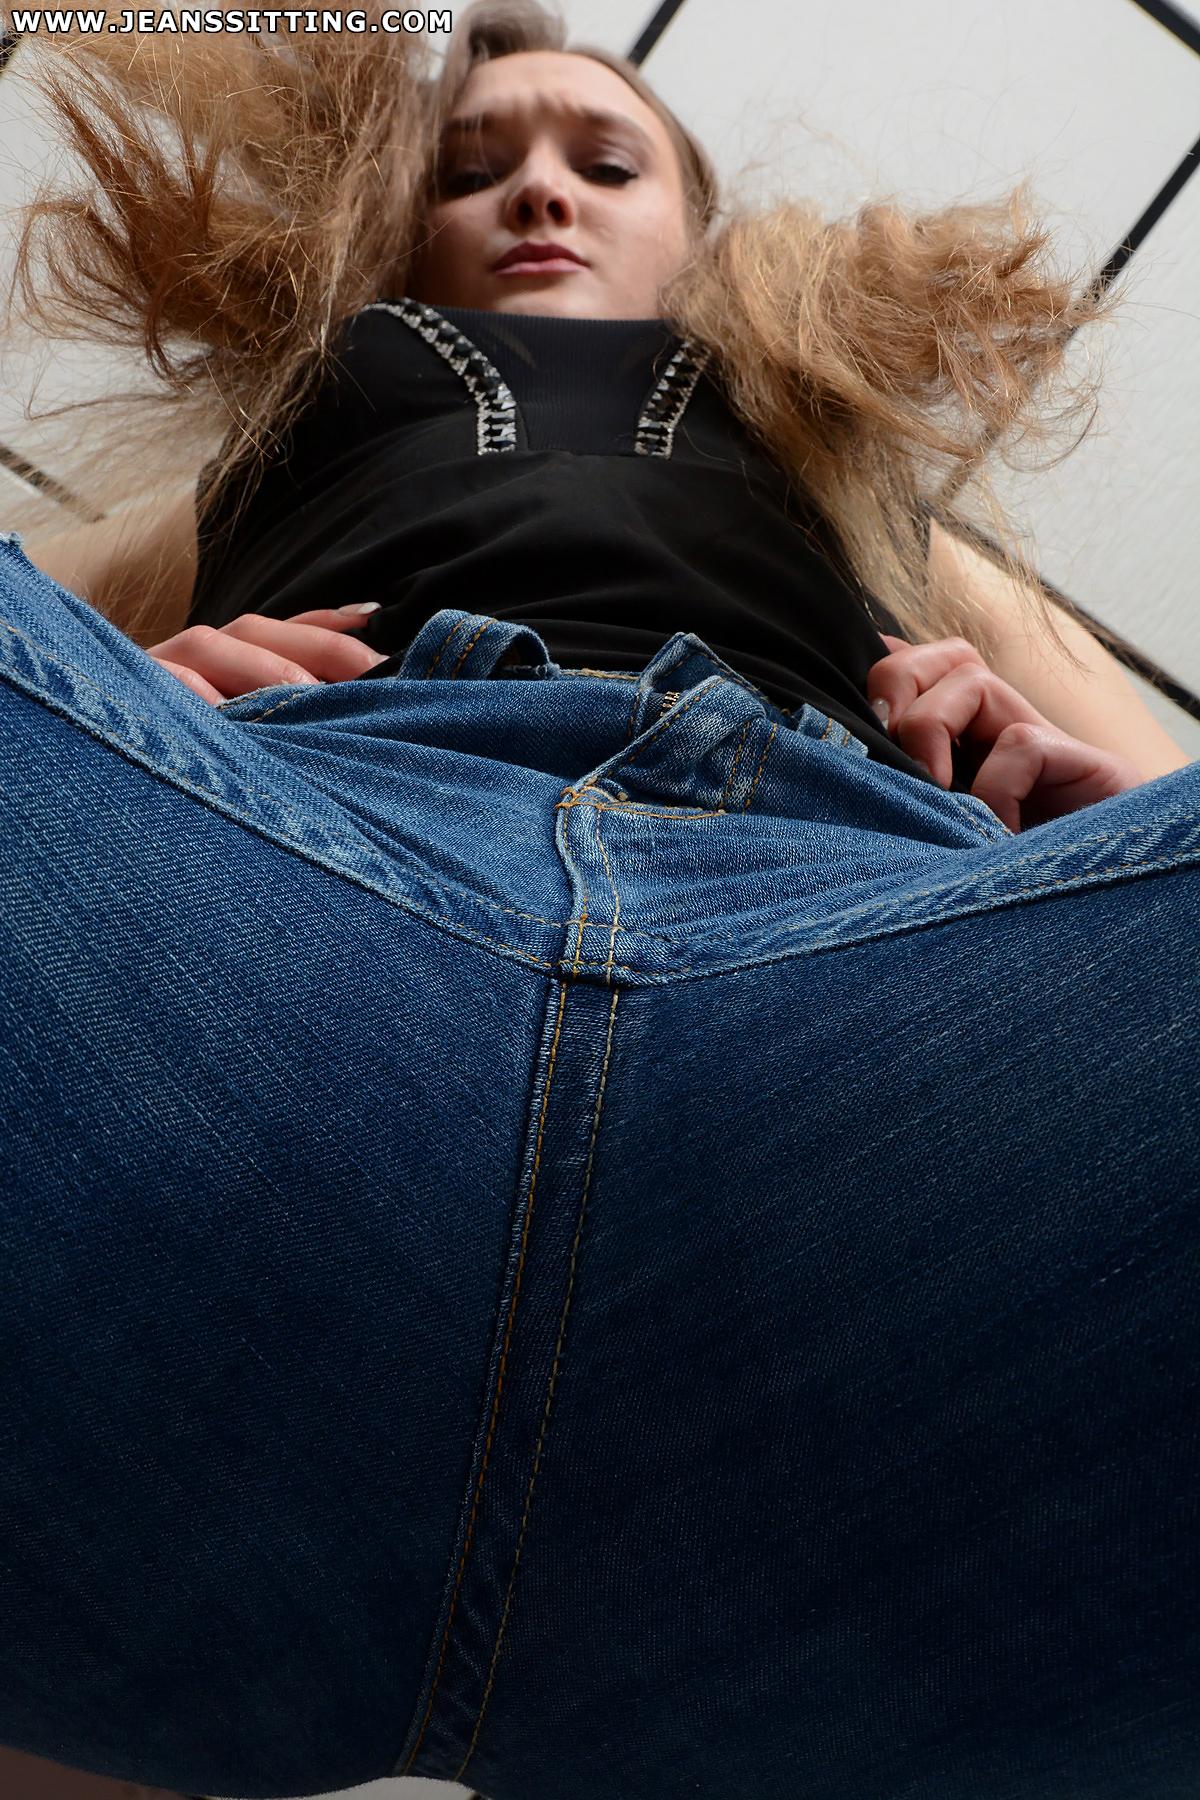 extrem facesitting ladies stendal